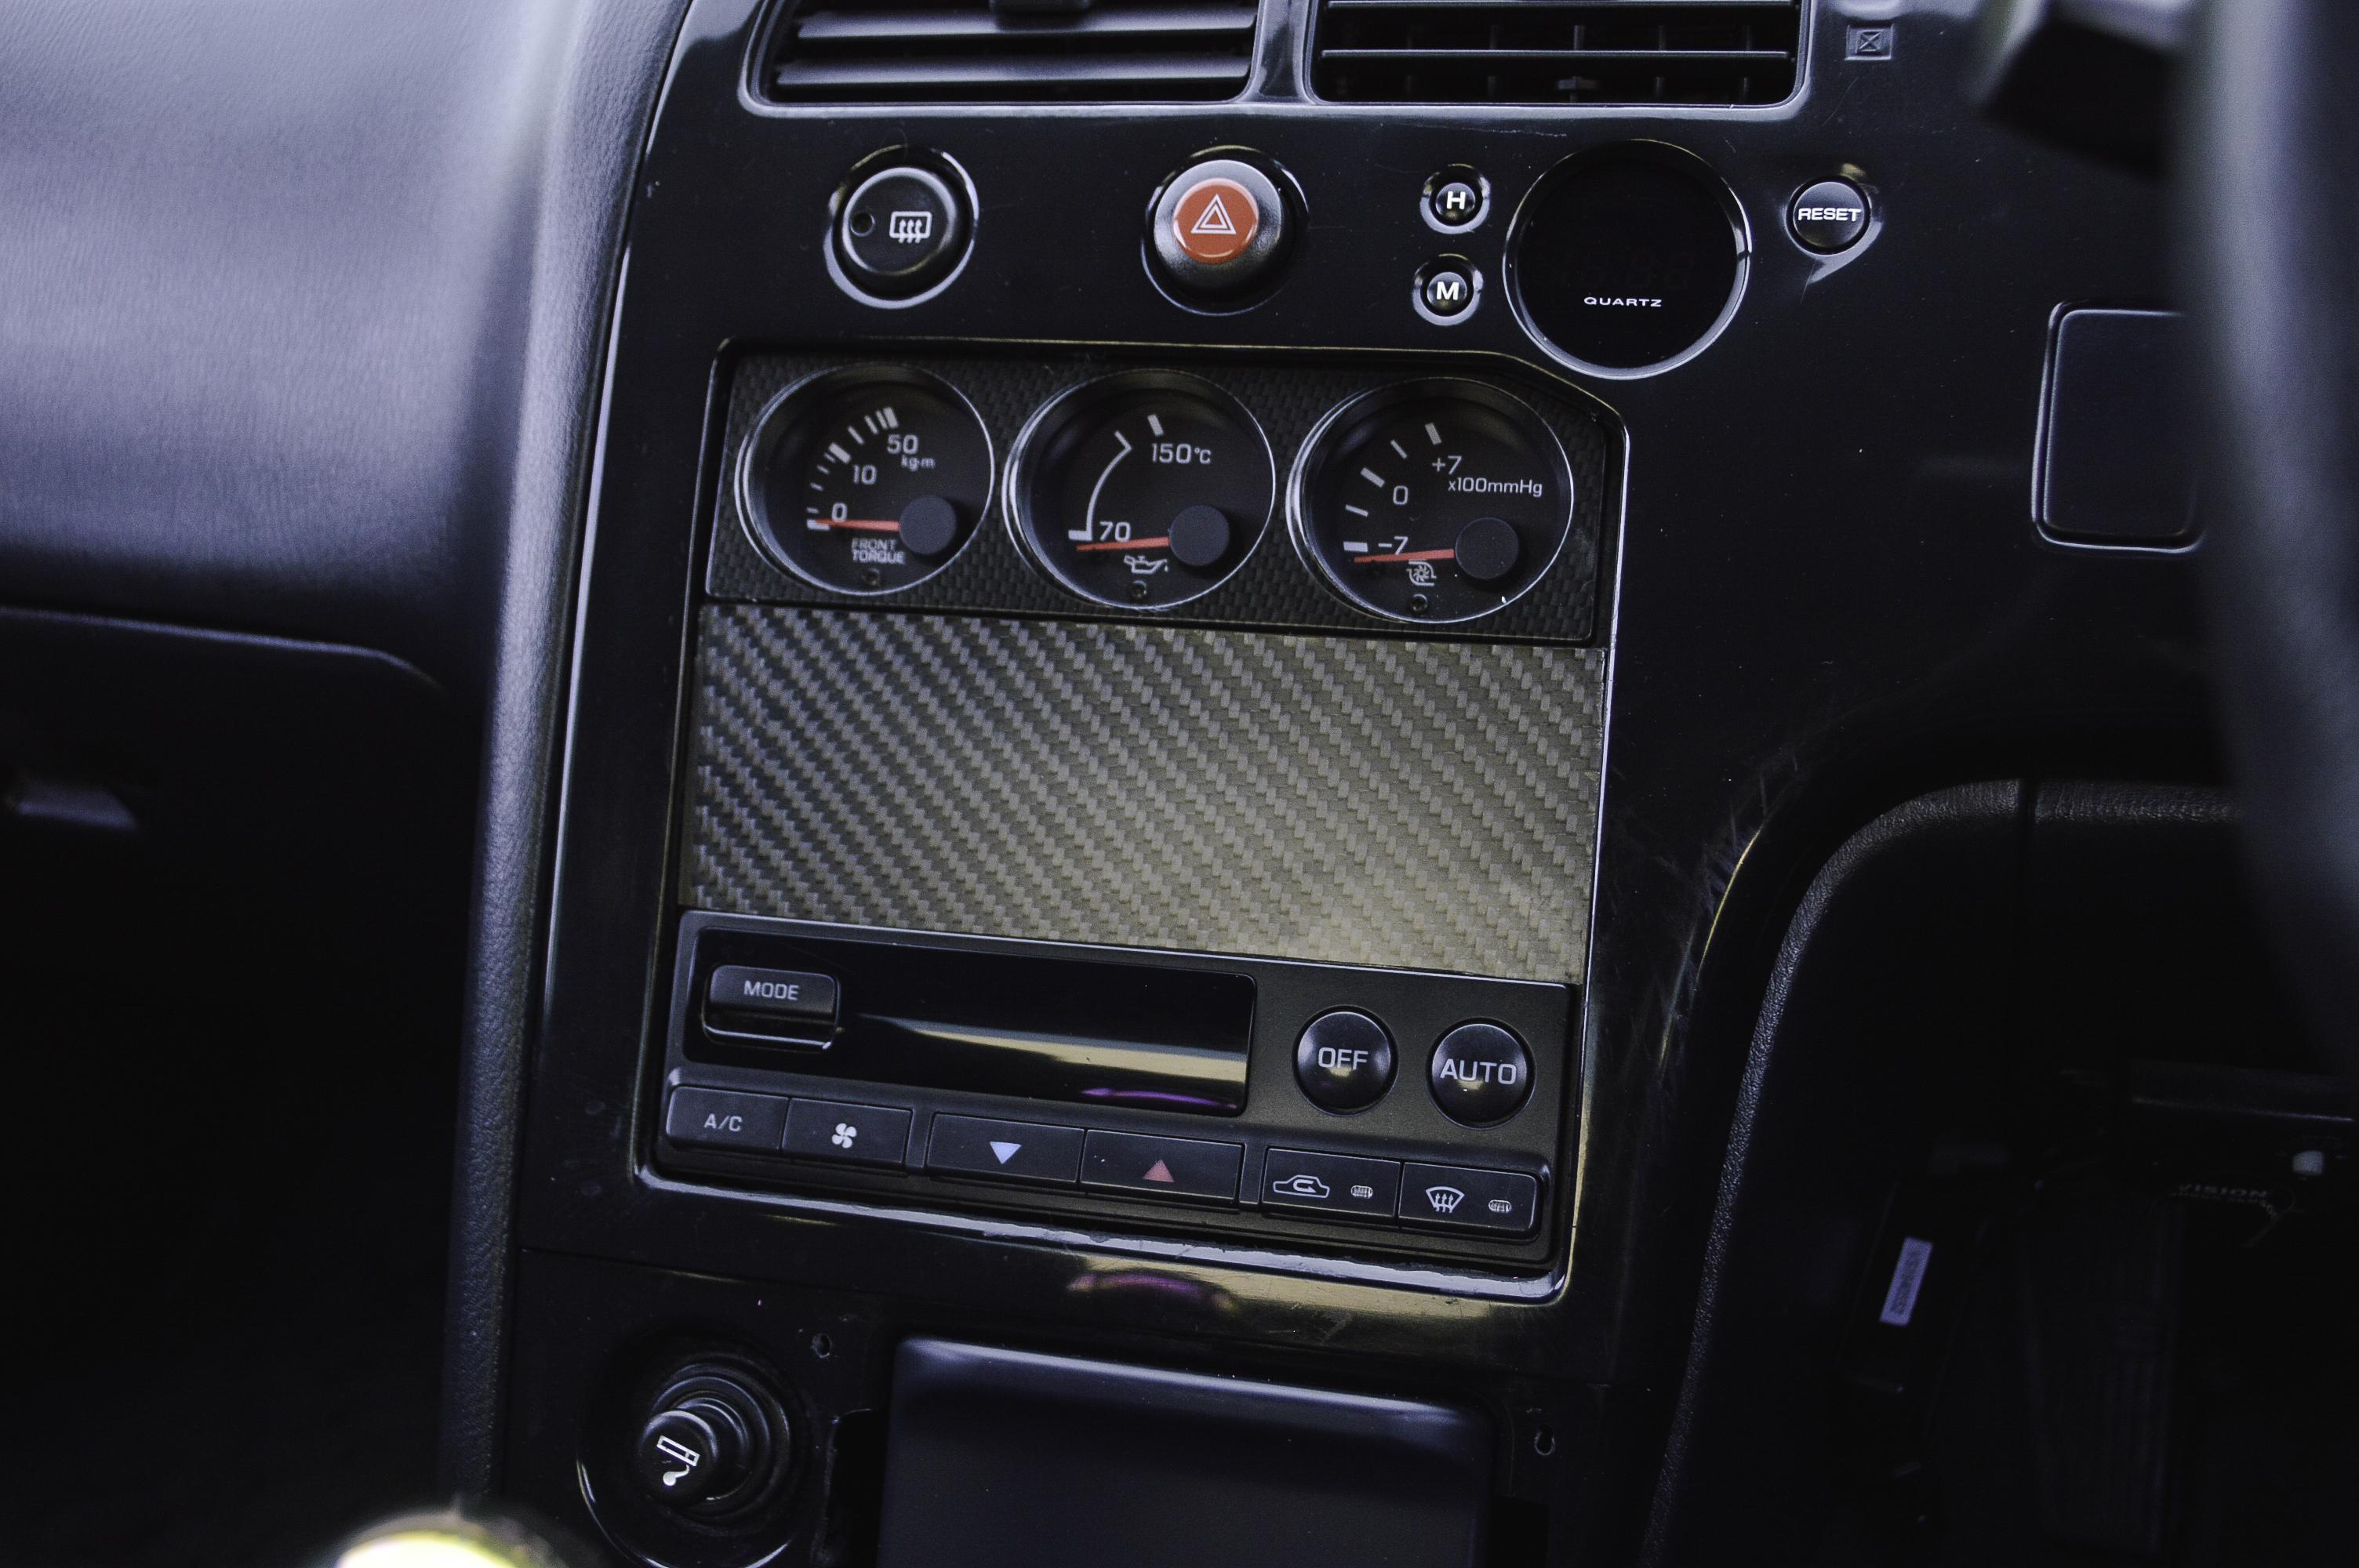 R33 GT-R radio delete